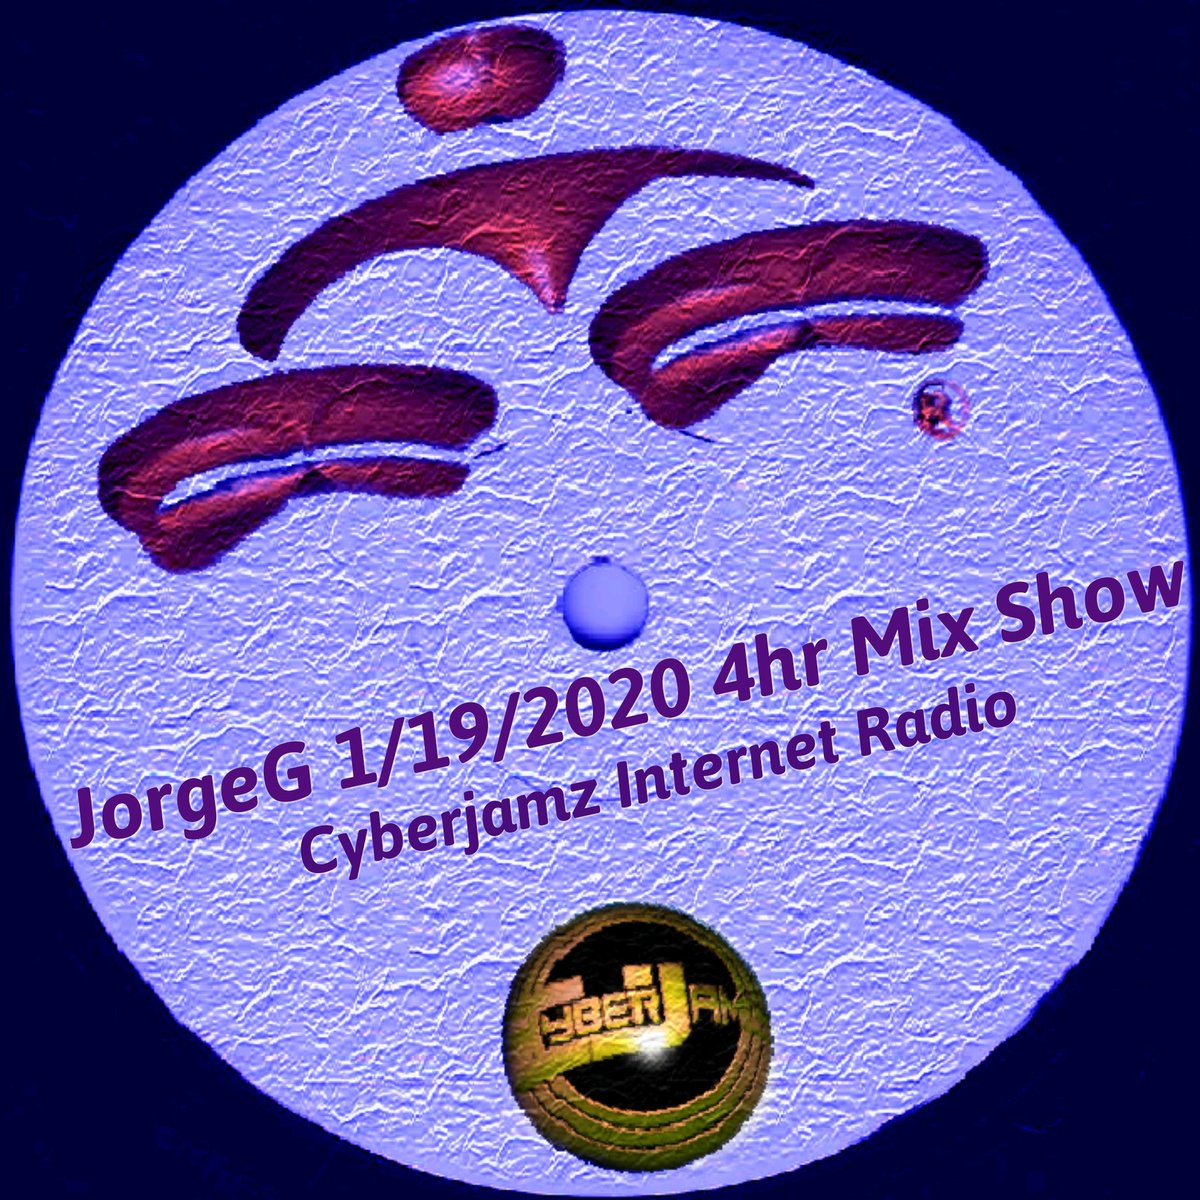 @JorgeG179 My #Sunday 4hr #MixSet via #Cyberjamz #InternetRadio http://dyn.cyberjamz.com/archive.aspx?FID=Archive_20200119_001.asf… #Soulfulhouse #Afrohouse #Housemusic #Garagehouse #Techhouse #Techno #NuDisco #Disco #Funky #Dance #Clubmusic #Mashup #Live #InternetRadio #Dj #undergroundclub #MiamiSet